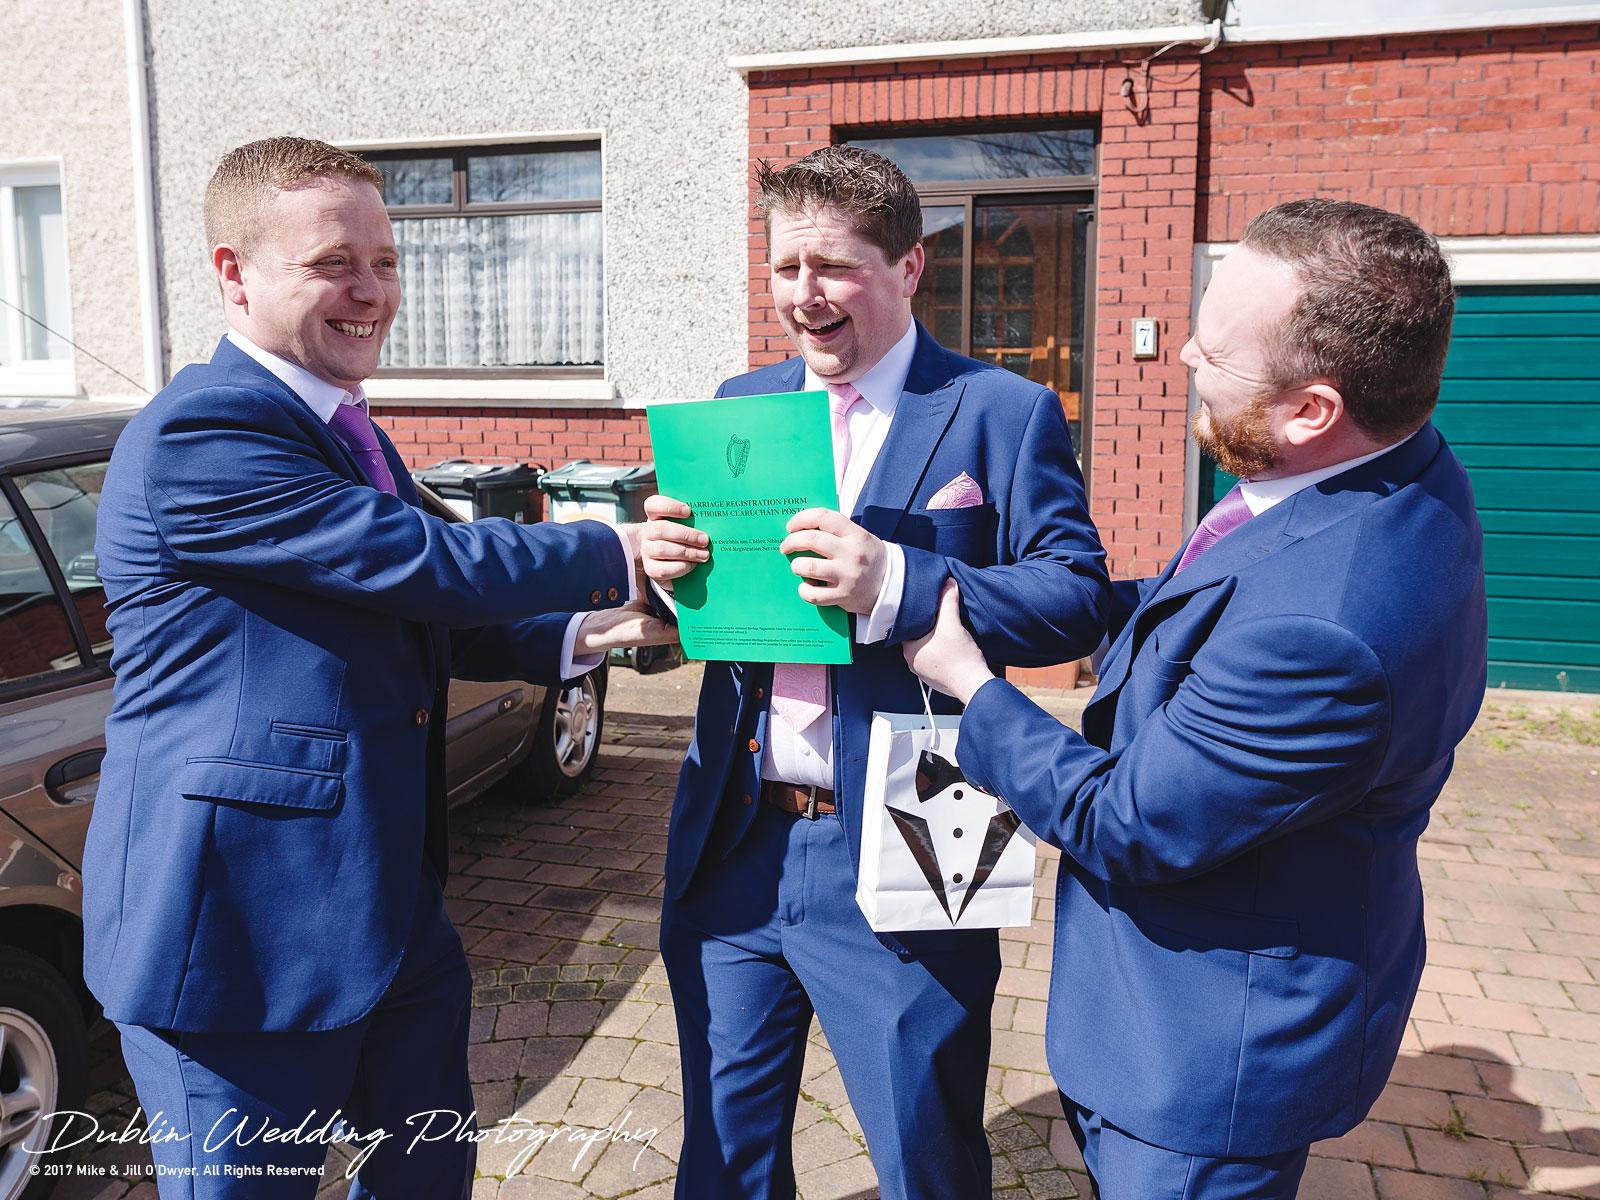 wedding-photographer-wicklow-glenview-hotel-KS015.jpg